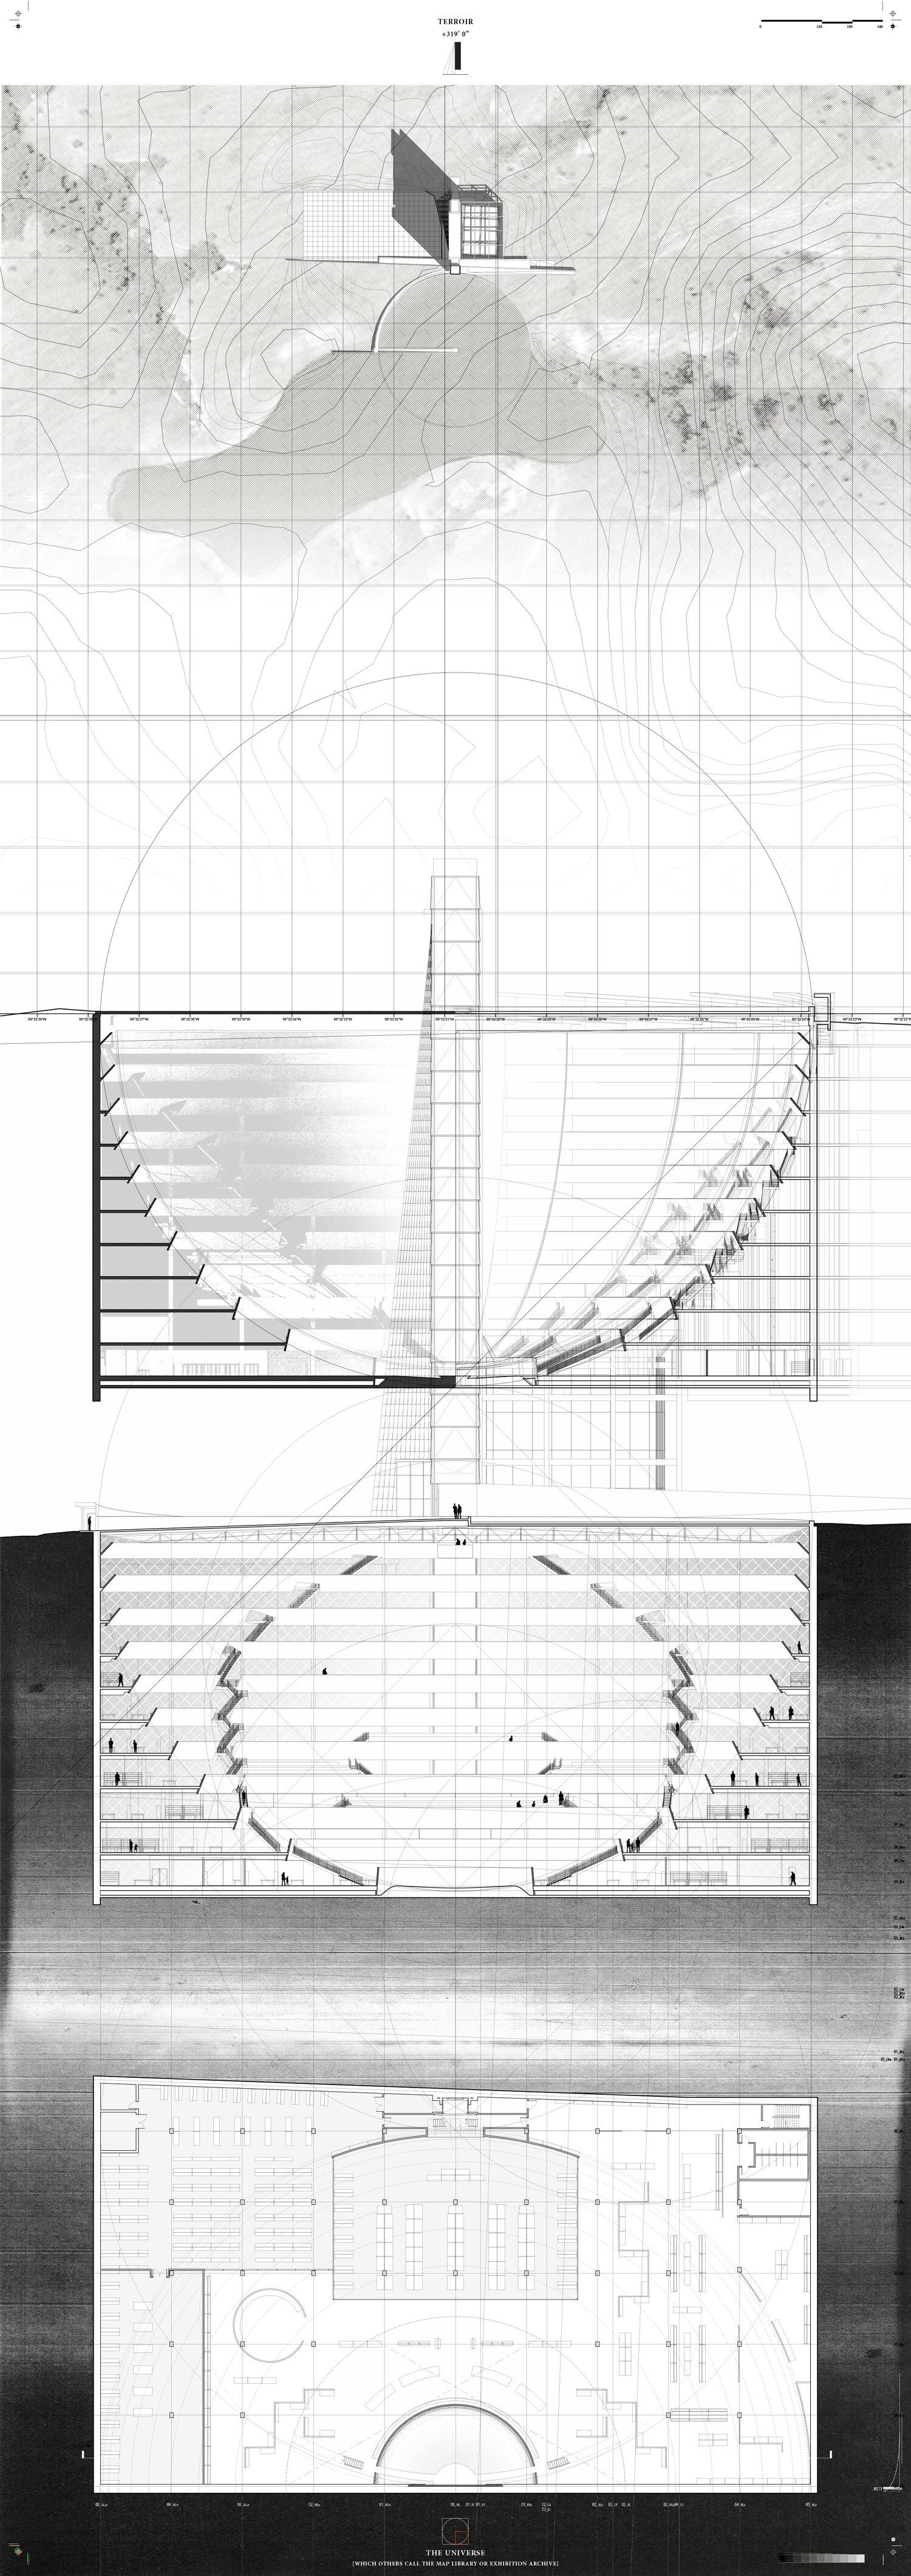 Final Plot Boards-7.jpg